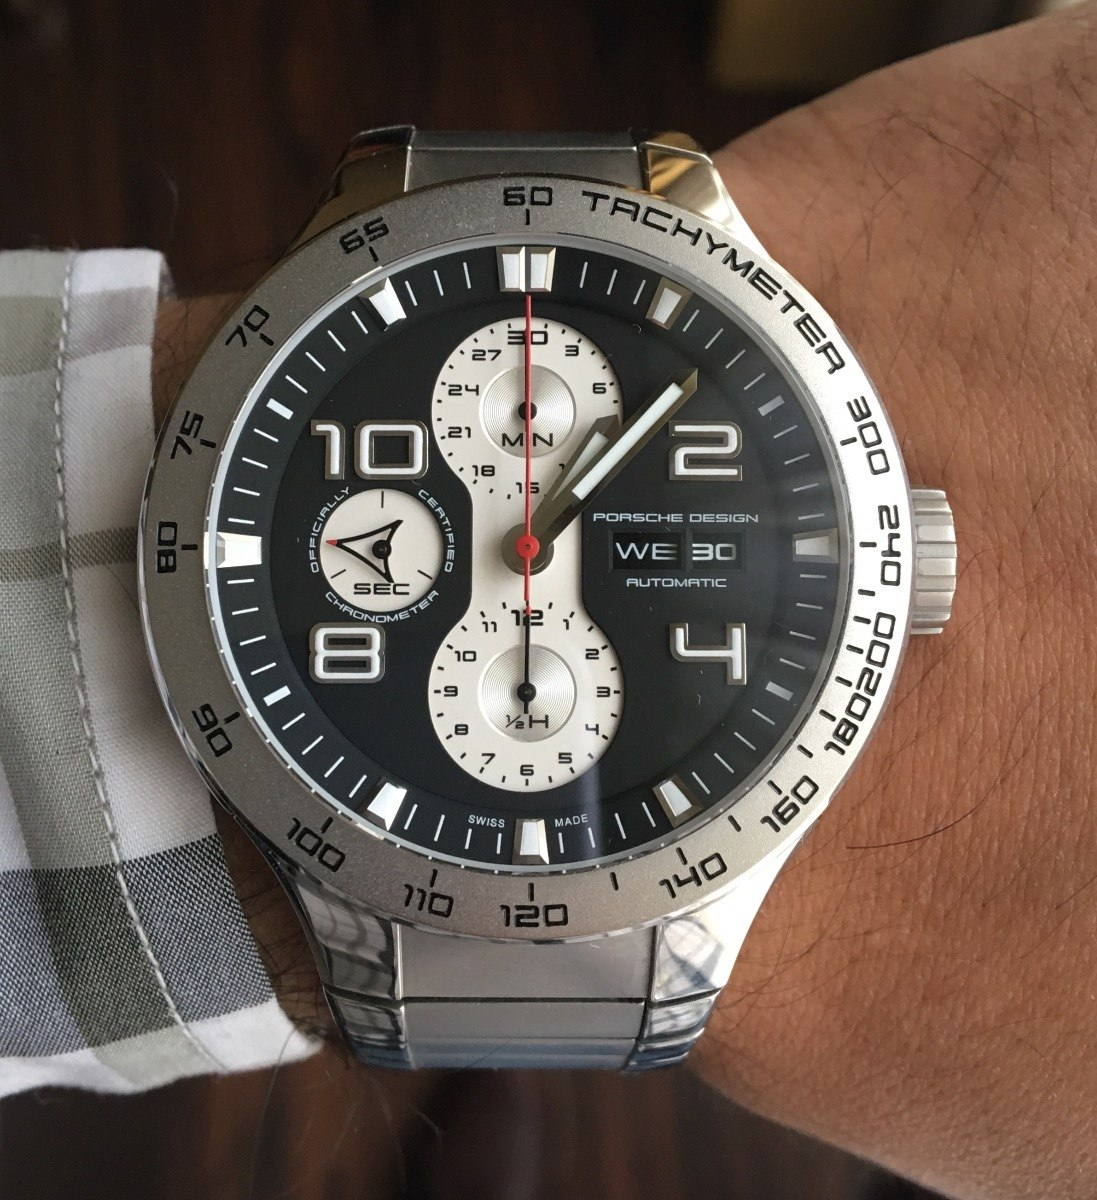 0fc0c5d55b5c reloj porsche design flat six p6340 cronografo automático. Cargando zoom.